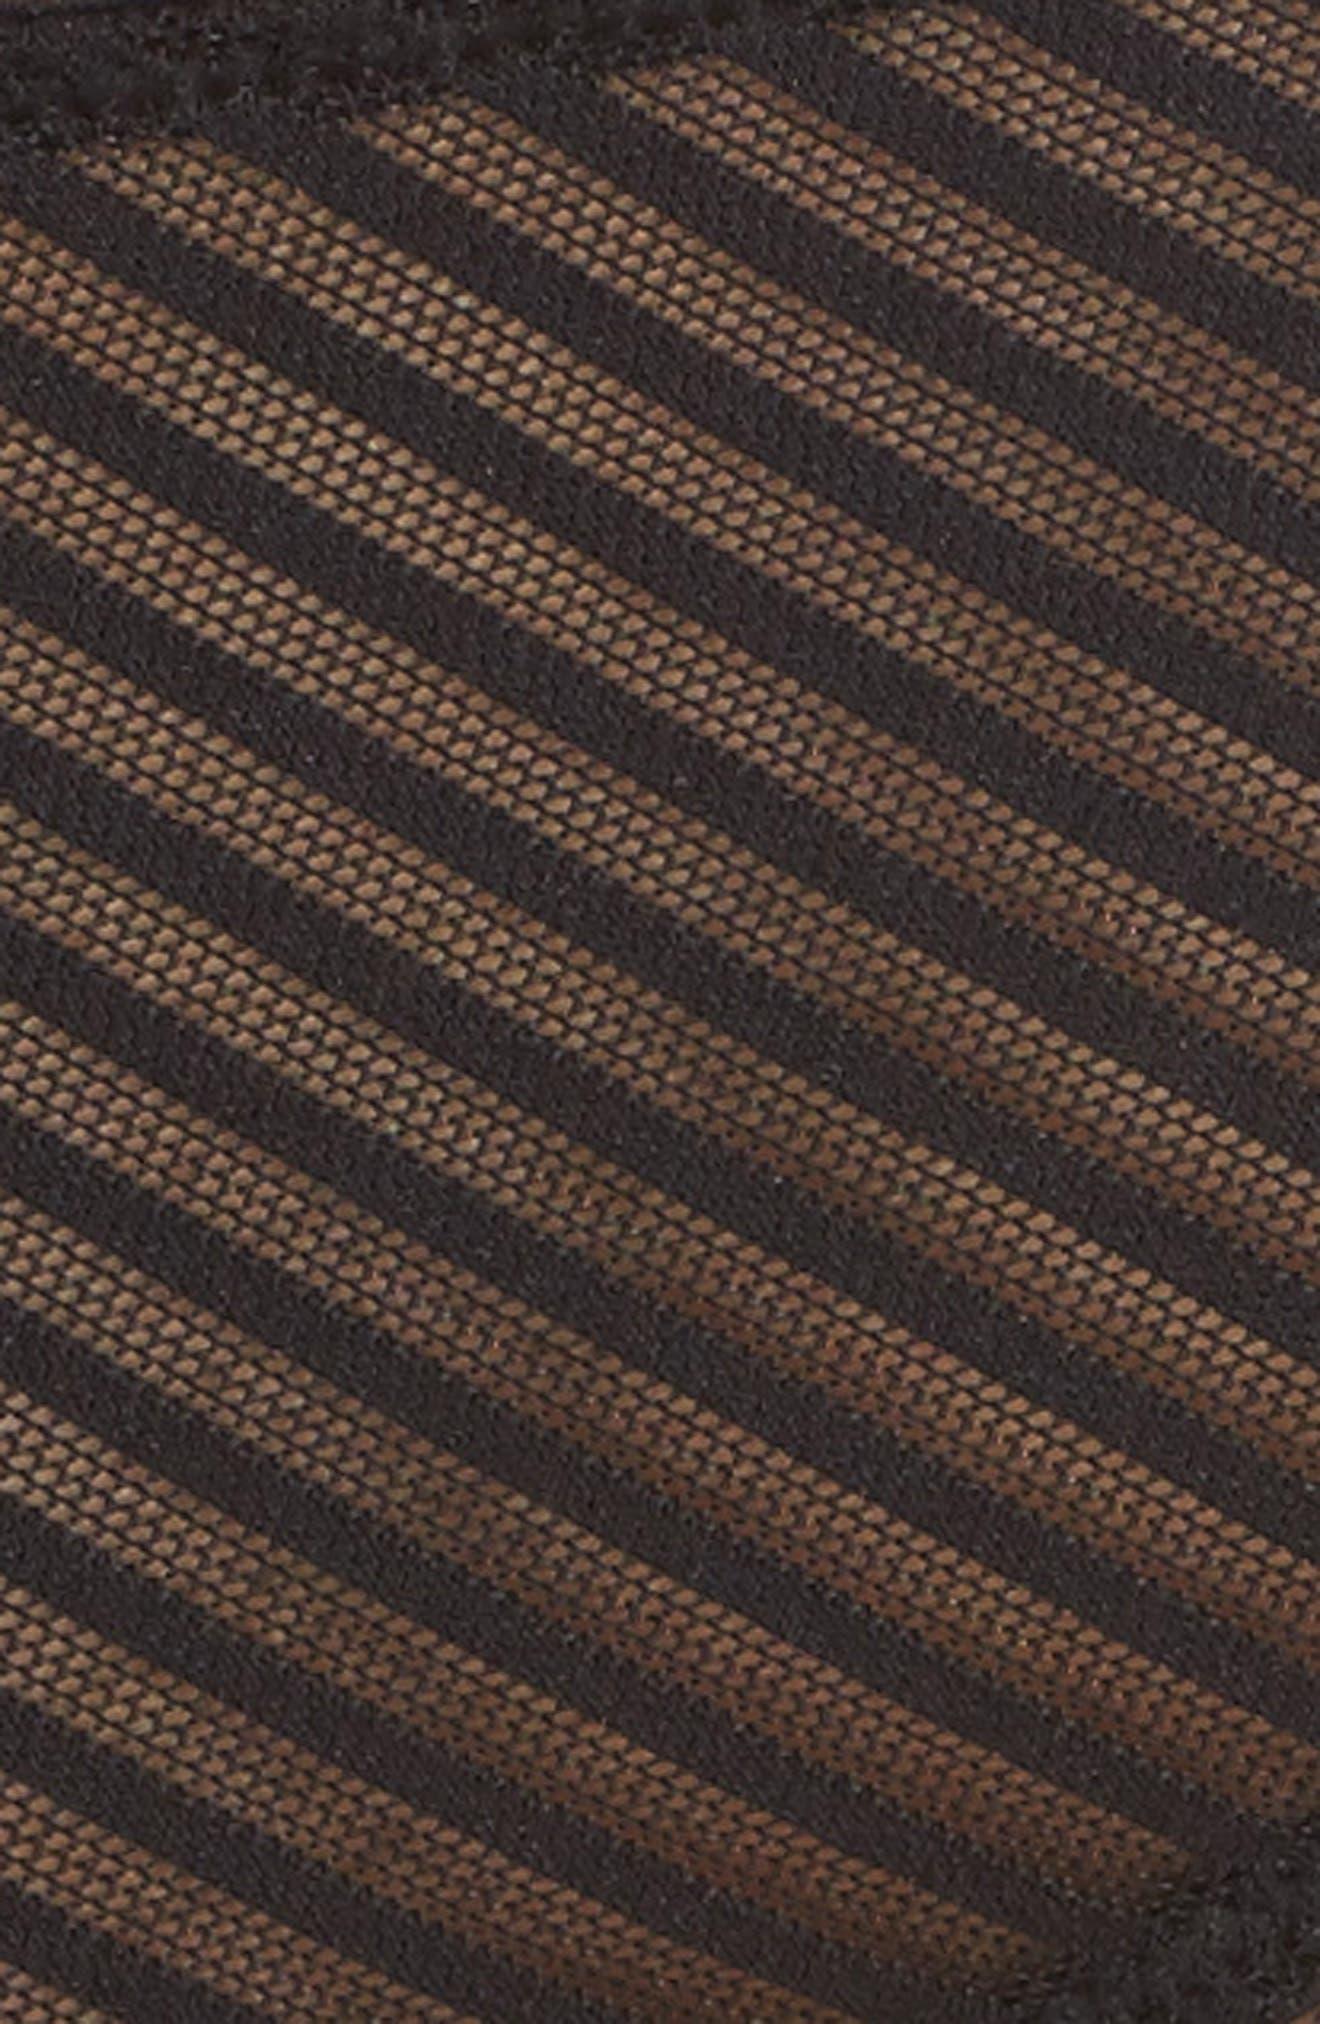 Shiny Stripe Hipster Panties,                             Alternate thumbnail 5, color,                             001